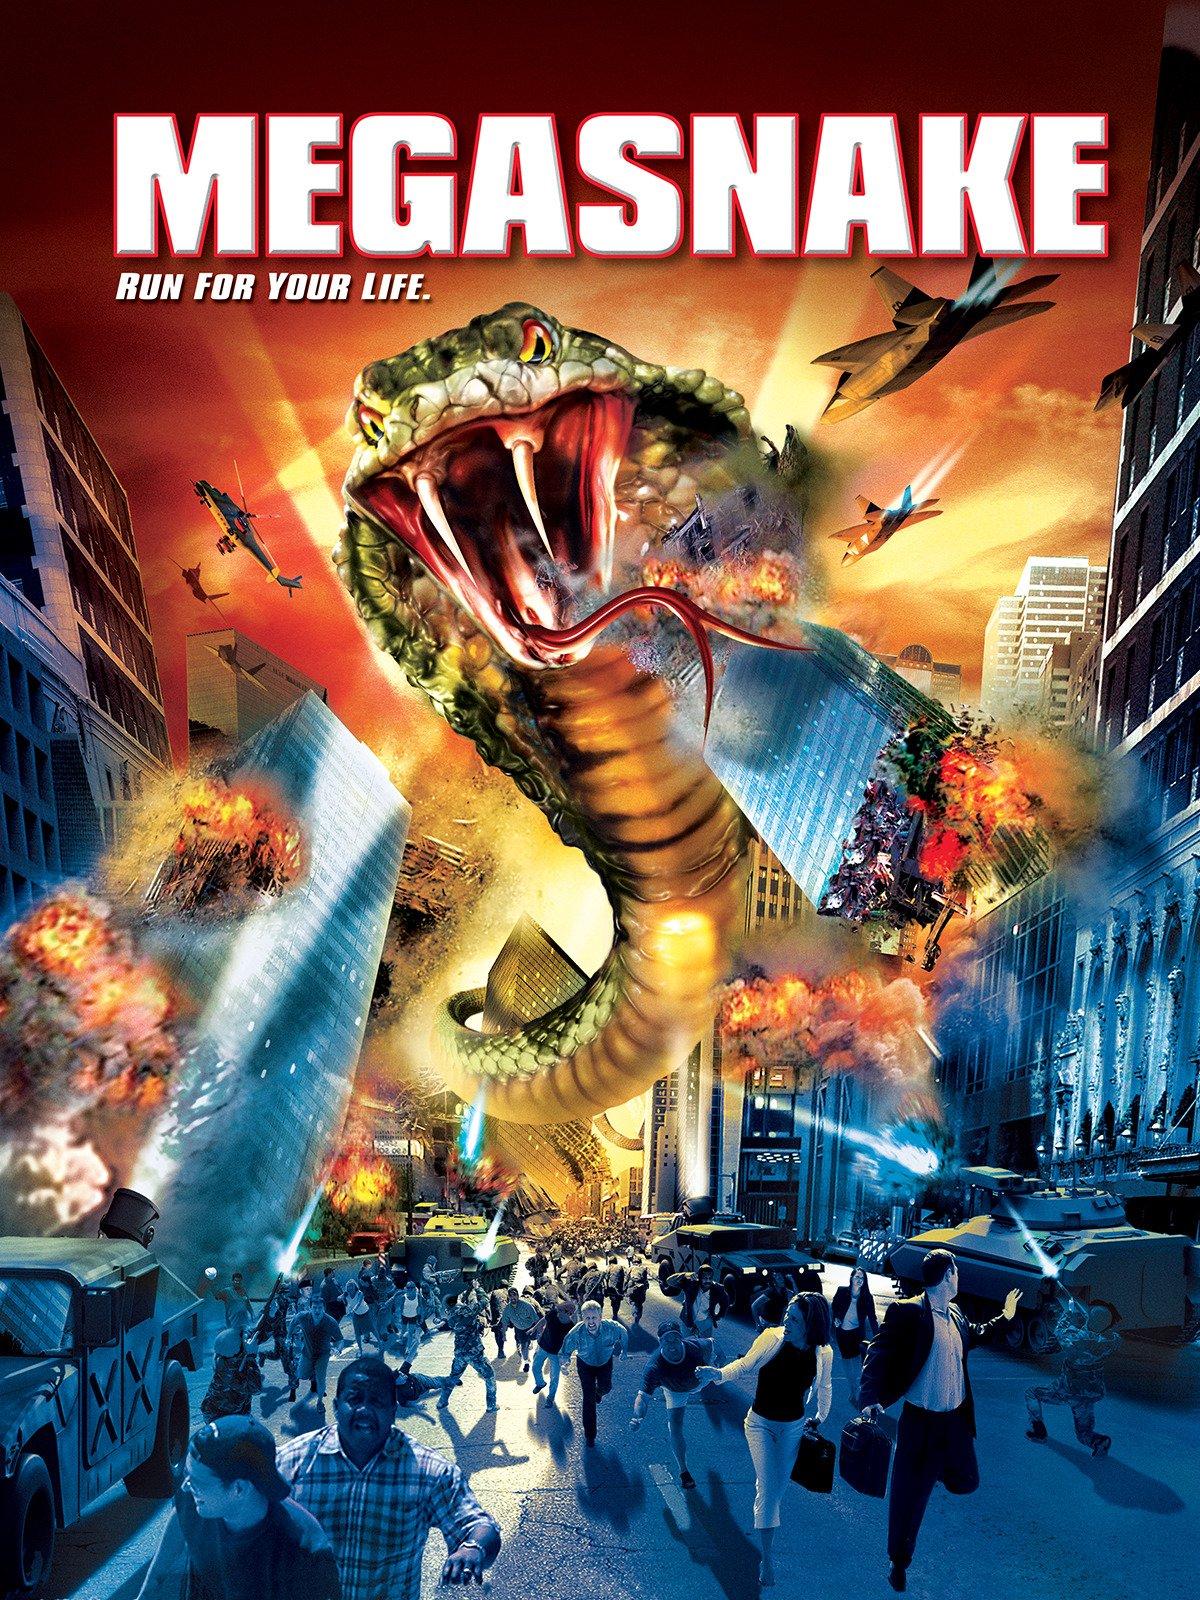 watch mega snake movie online for free